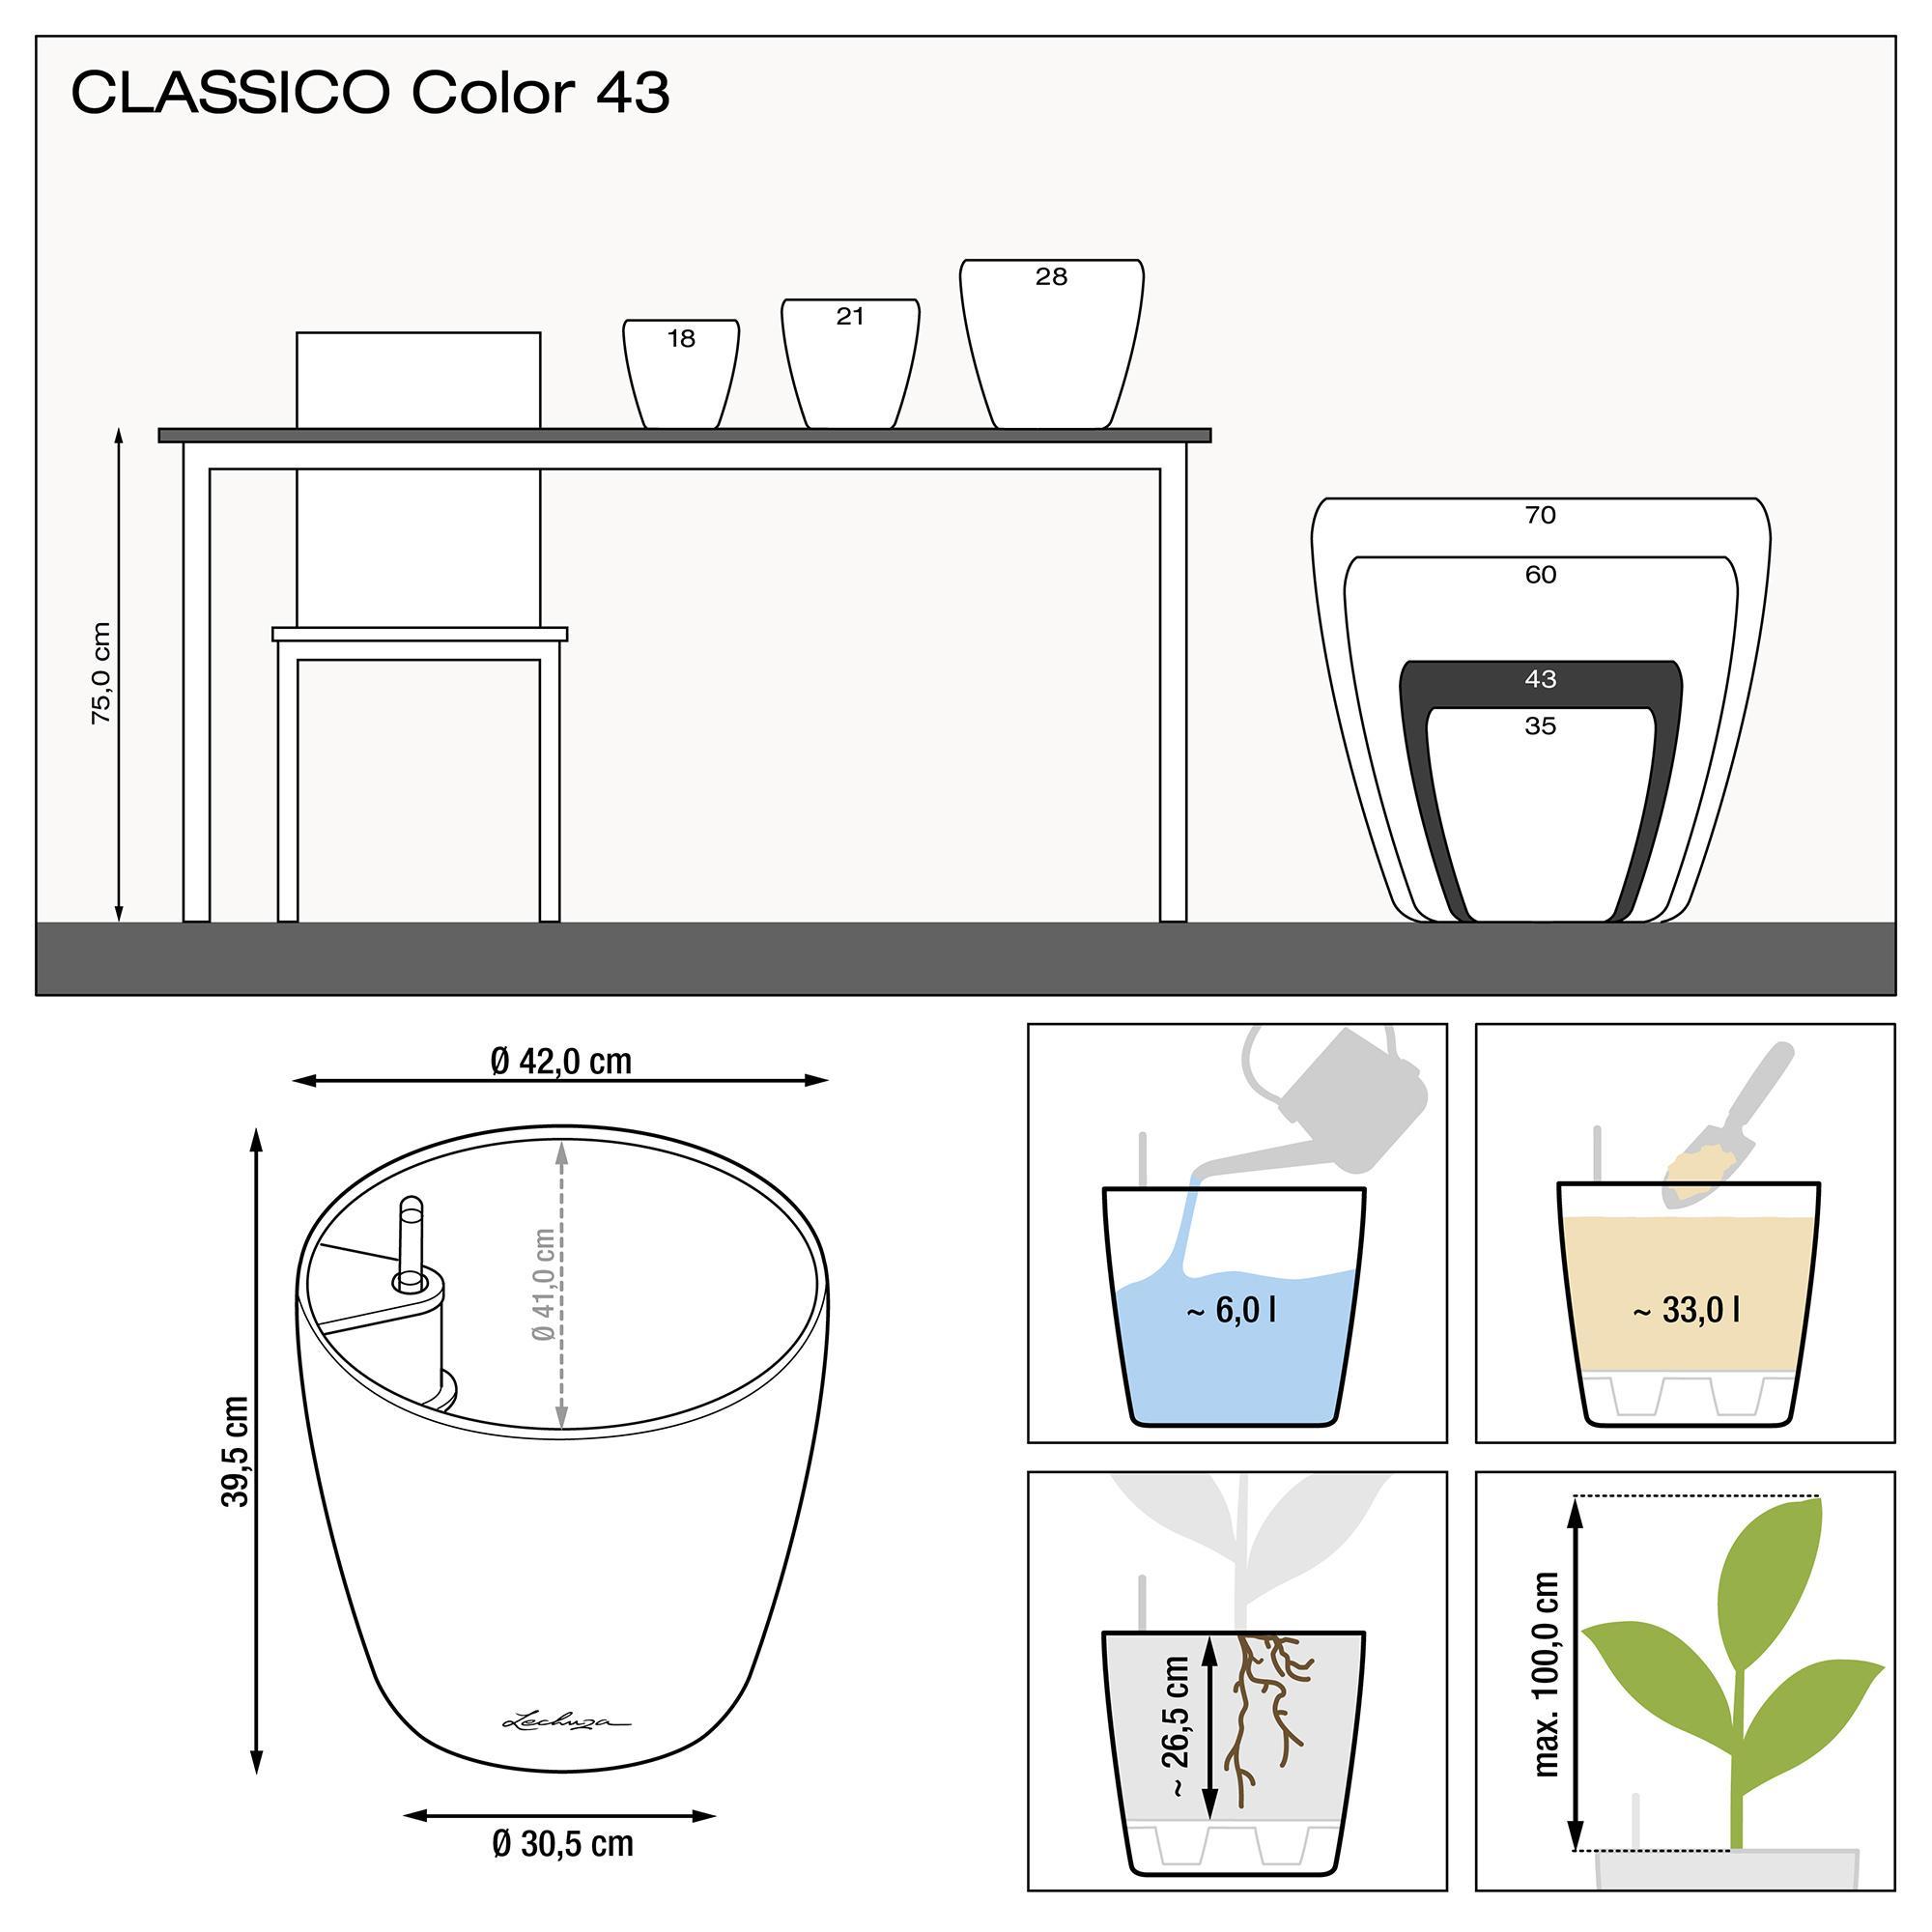 CLASSICO Color 43 slate - Image 2